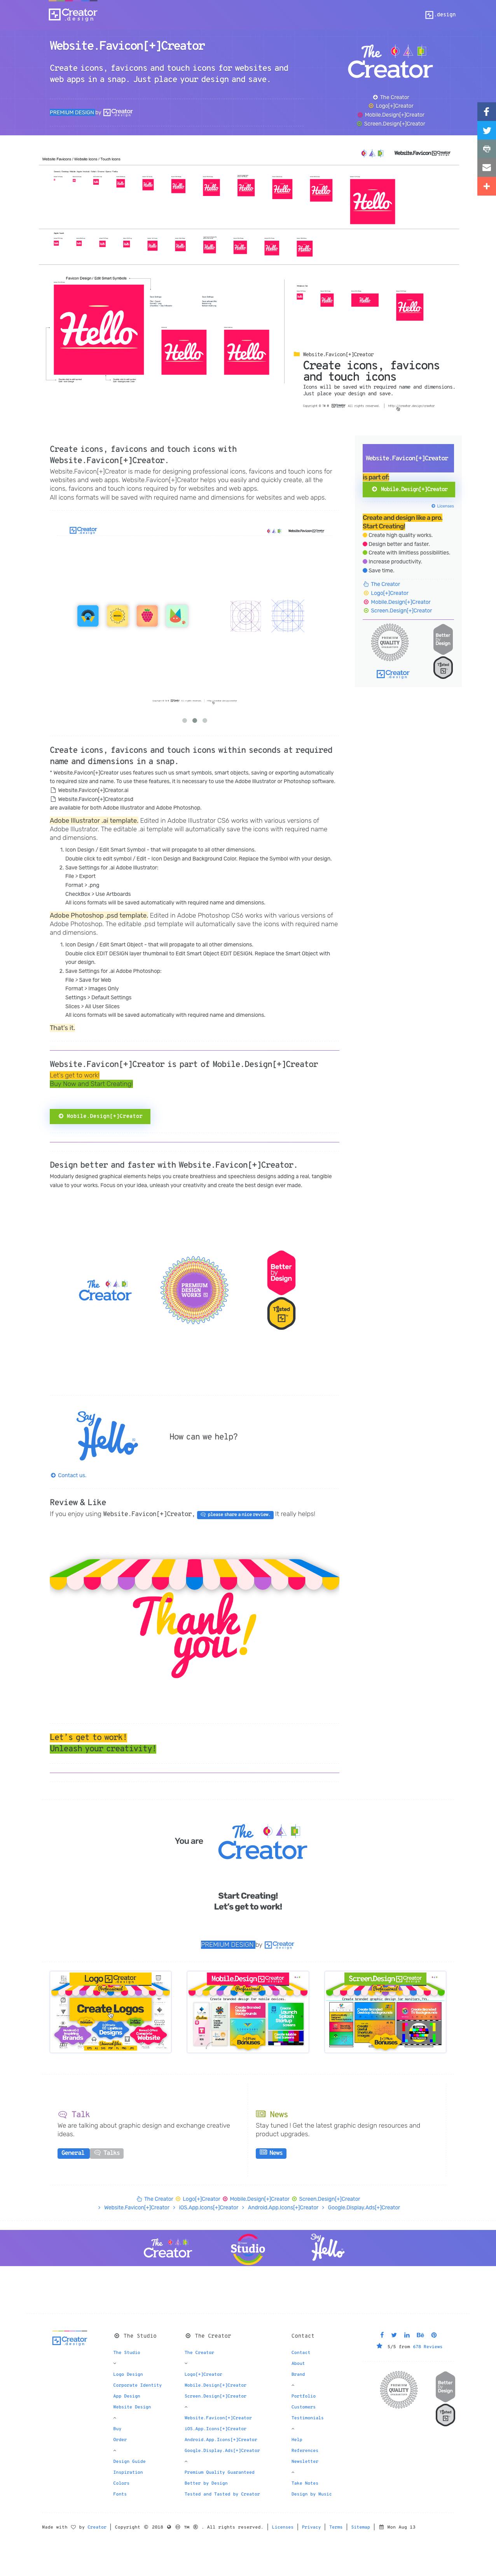 Website.Favicon[+]Creator Create icons, favicons and